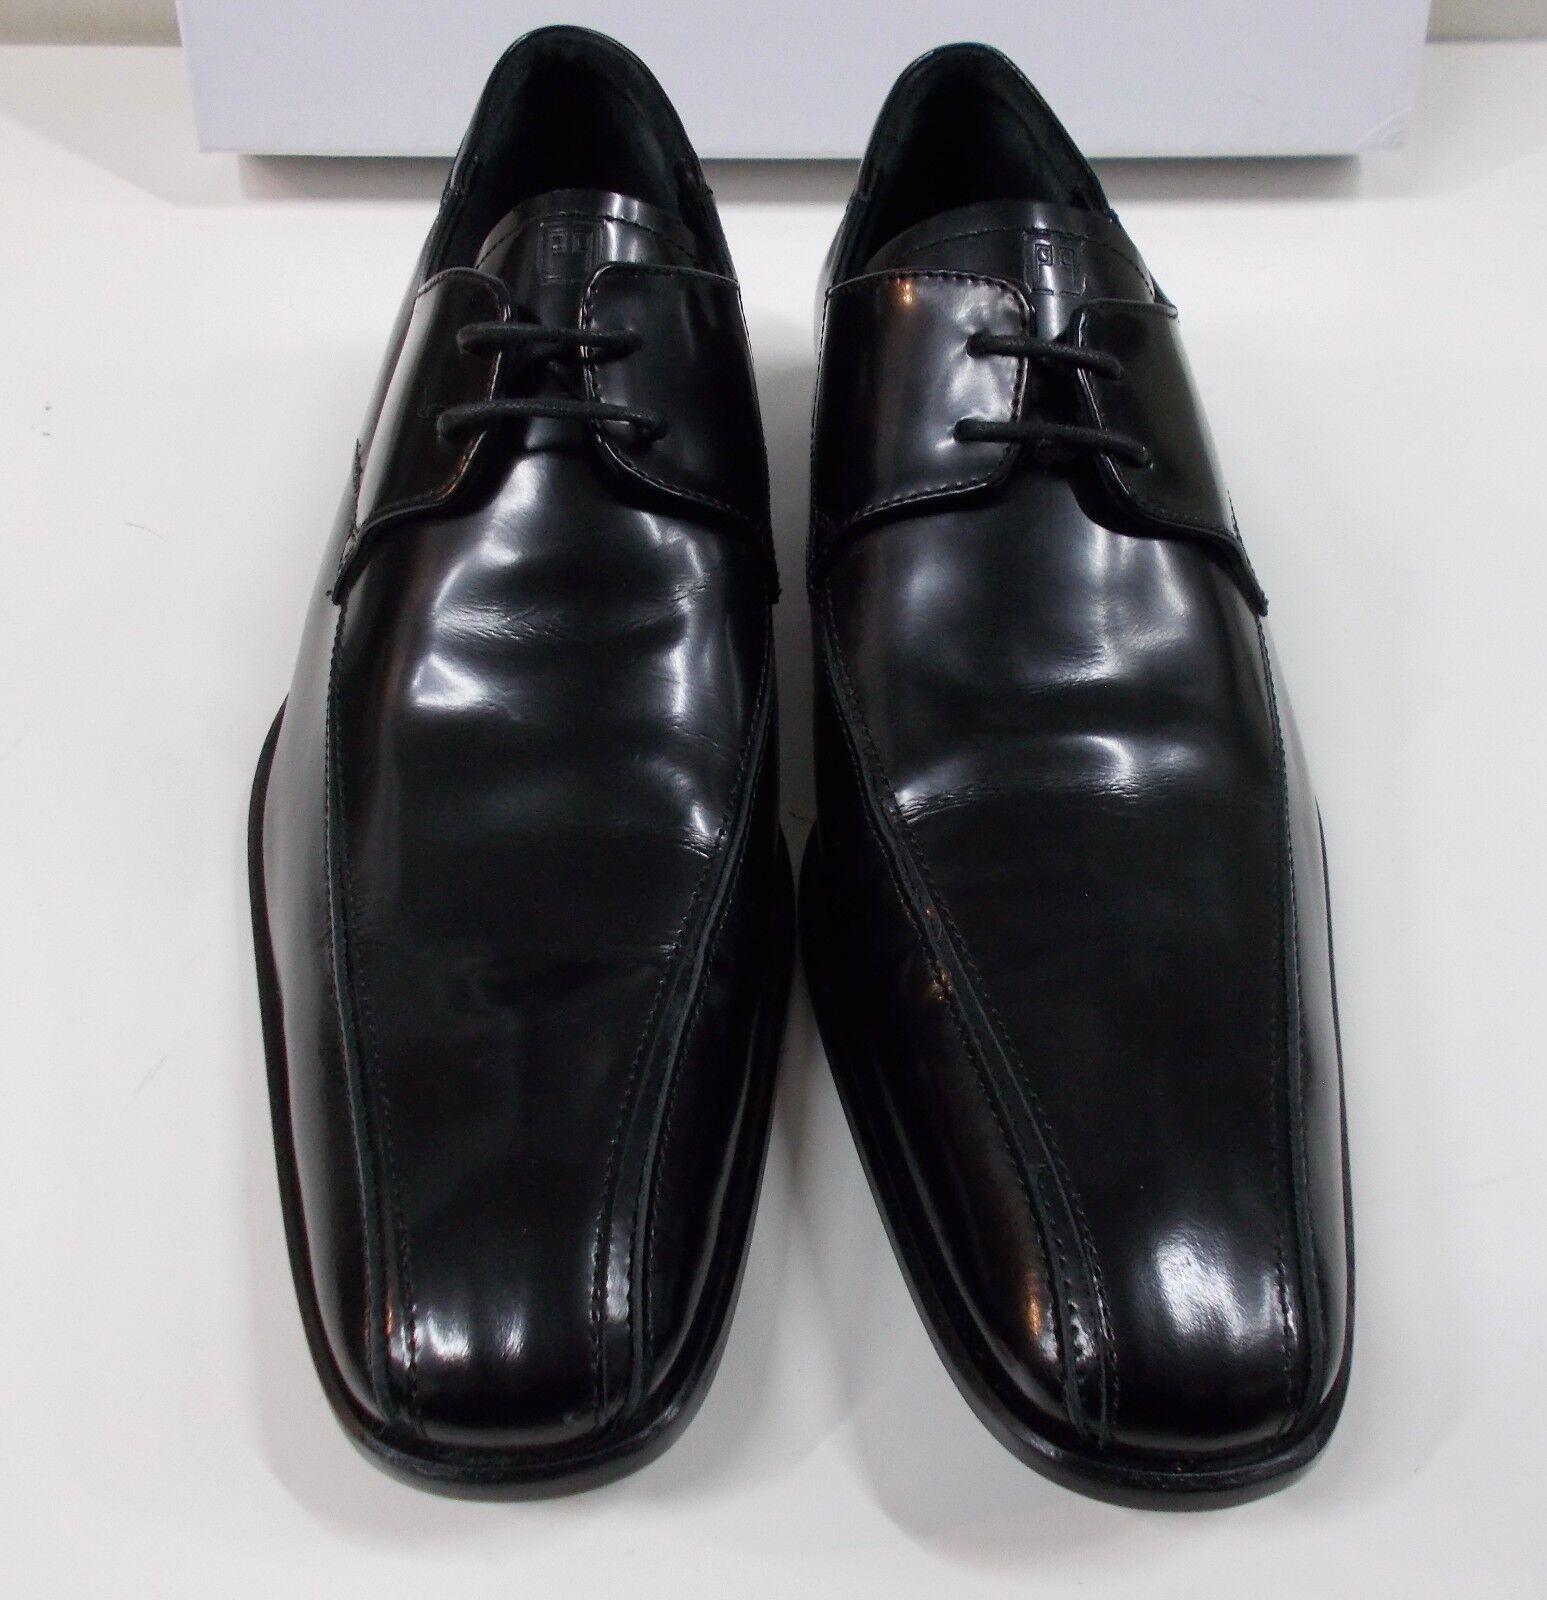 SCARPE UOMO  N.  41 CARLO PIGNATELLI SHOES MAN  N. M nner chaussures  мужская обувь ff89b1